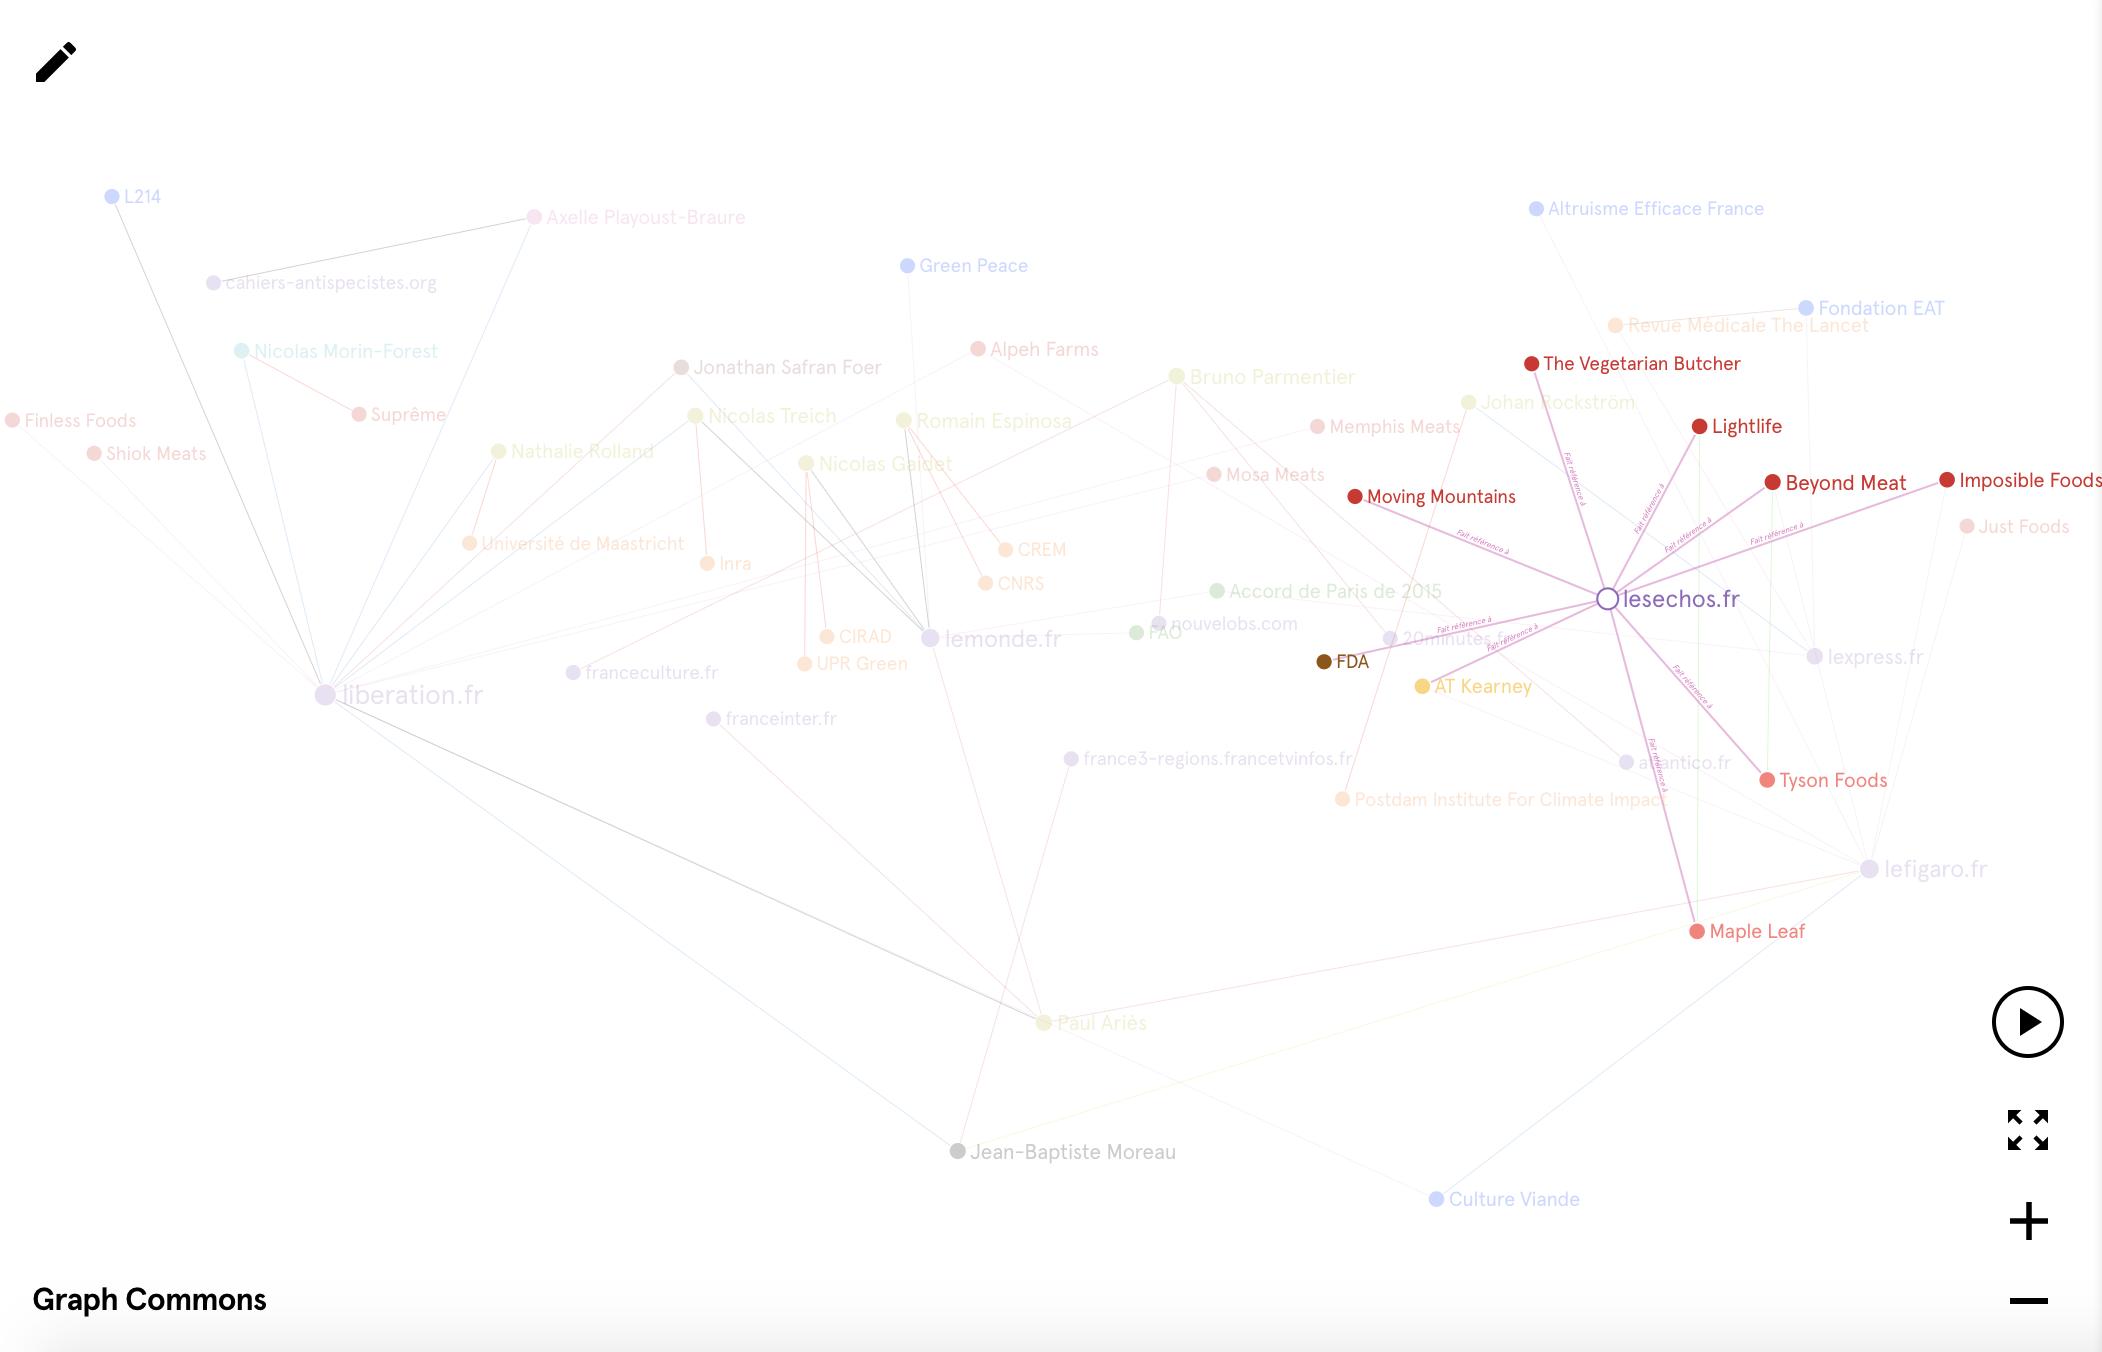 Screenshot cartographie des controverses alimentation ecologie